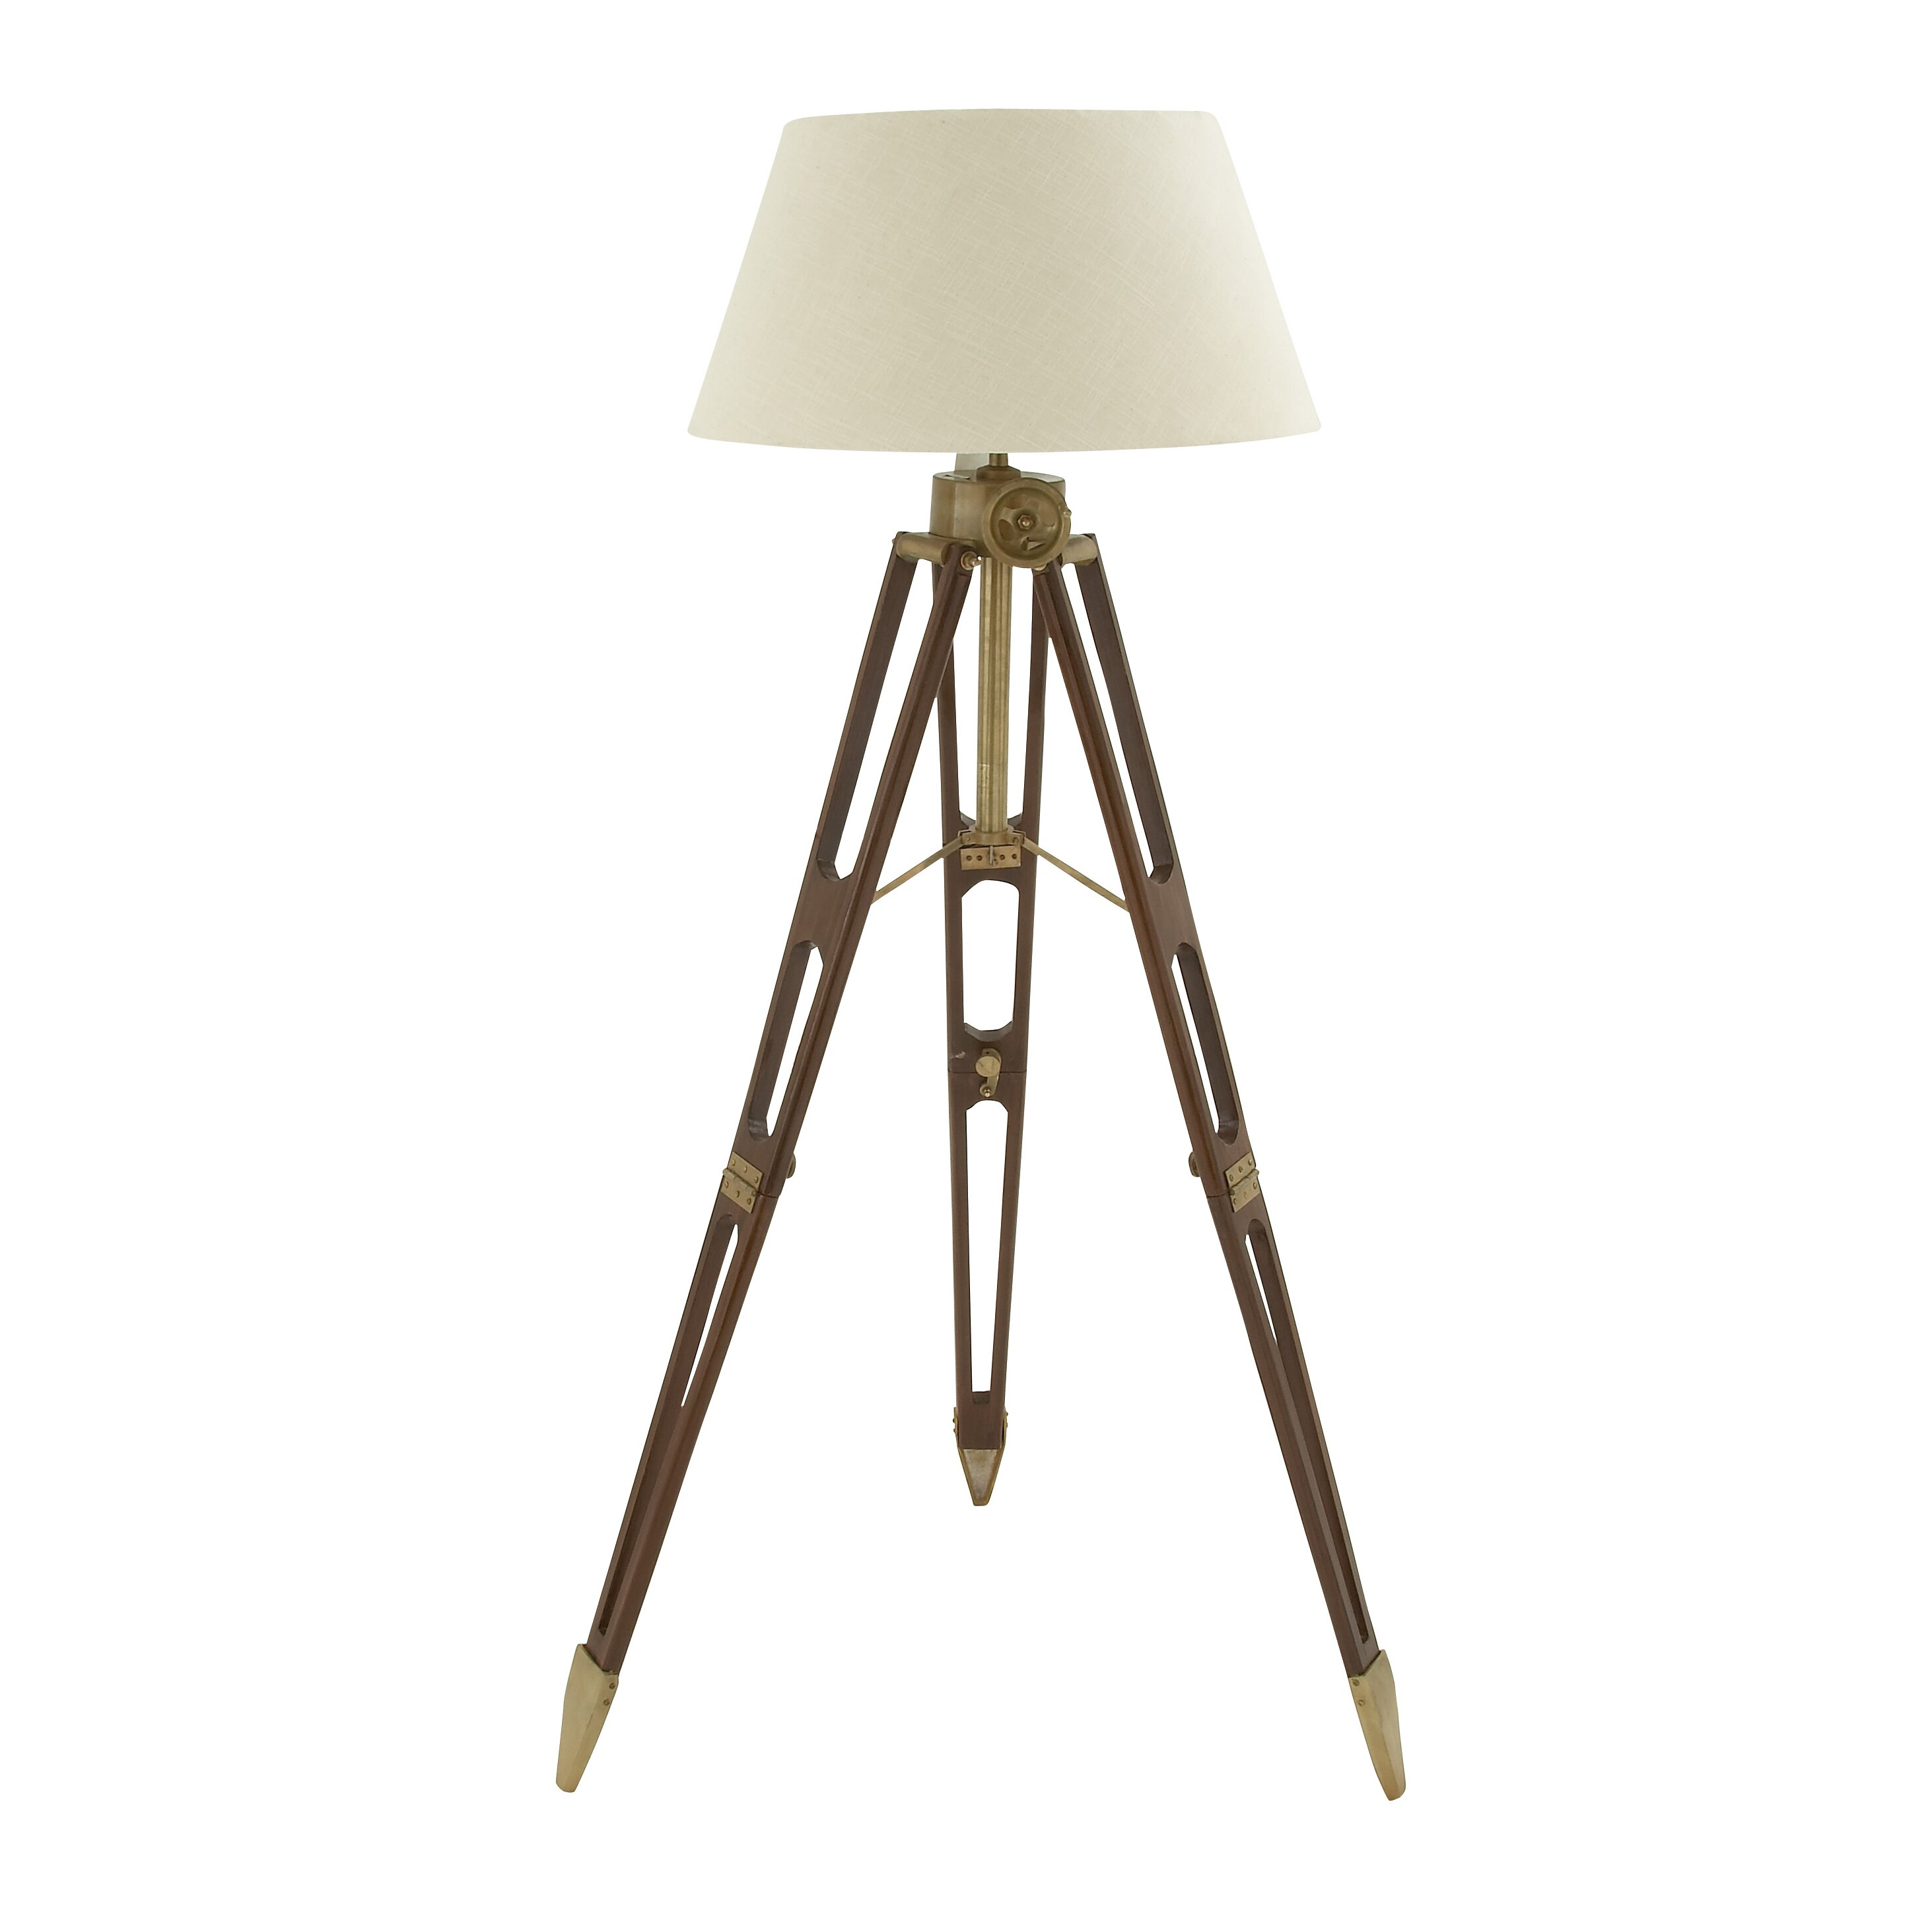 Woodland imports 67 tripod floor lamp reviews wayfair for Wayfair industrial lamp